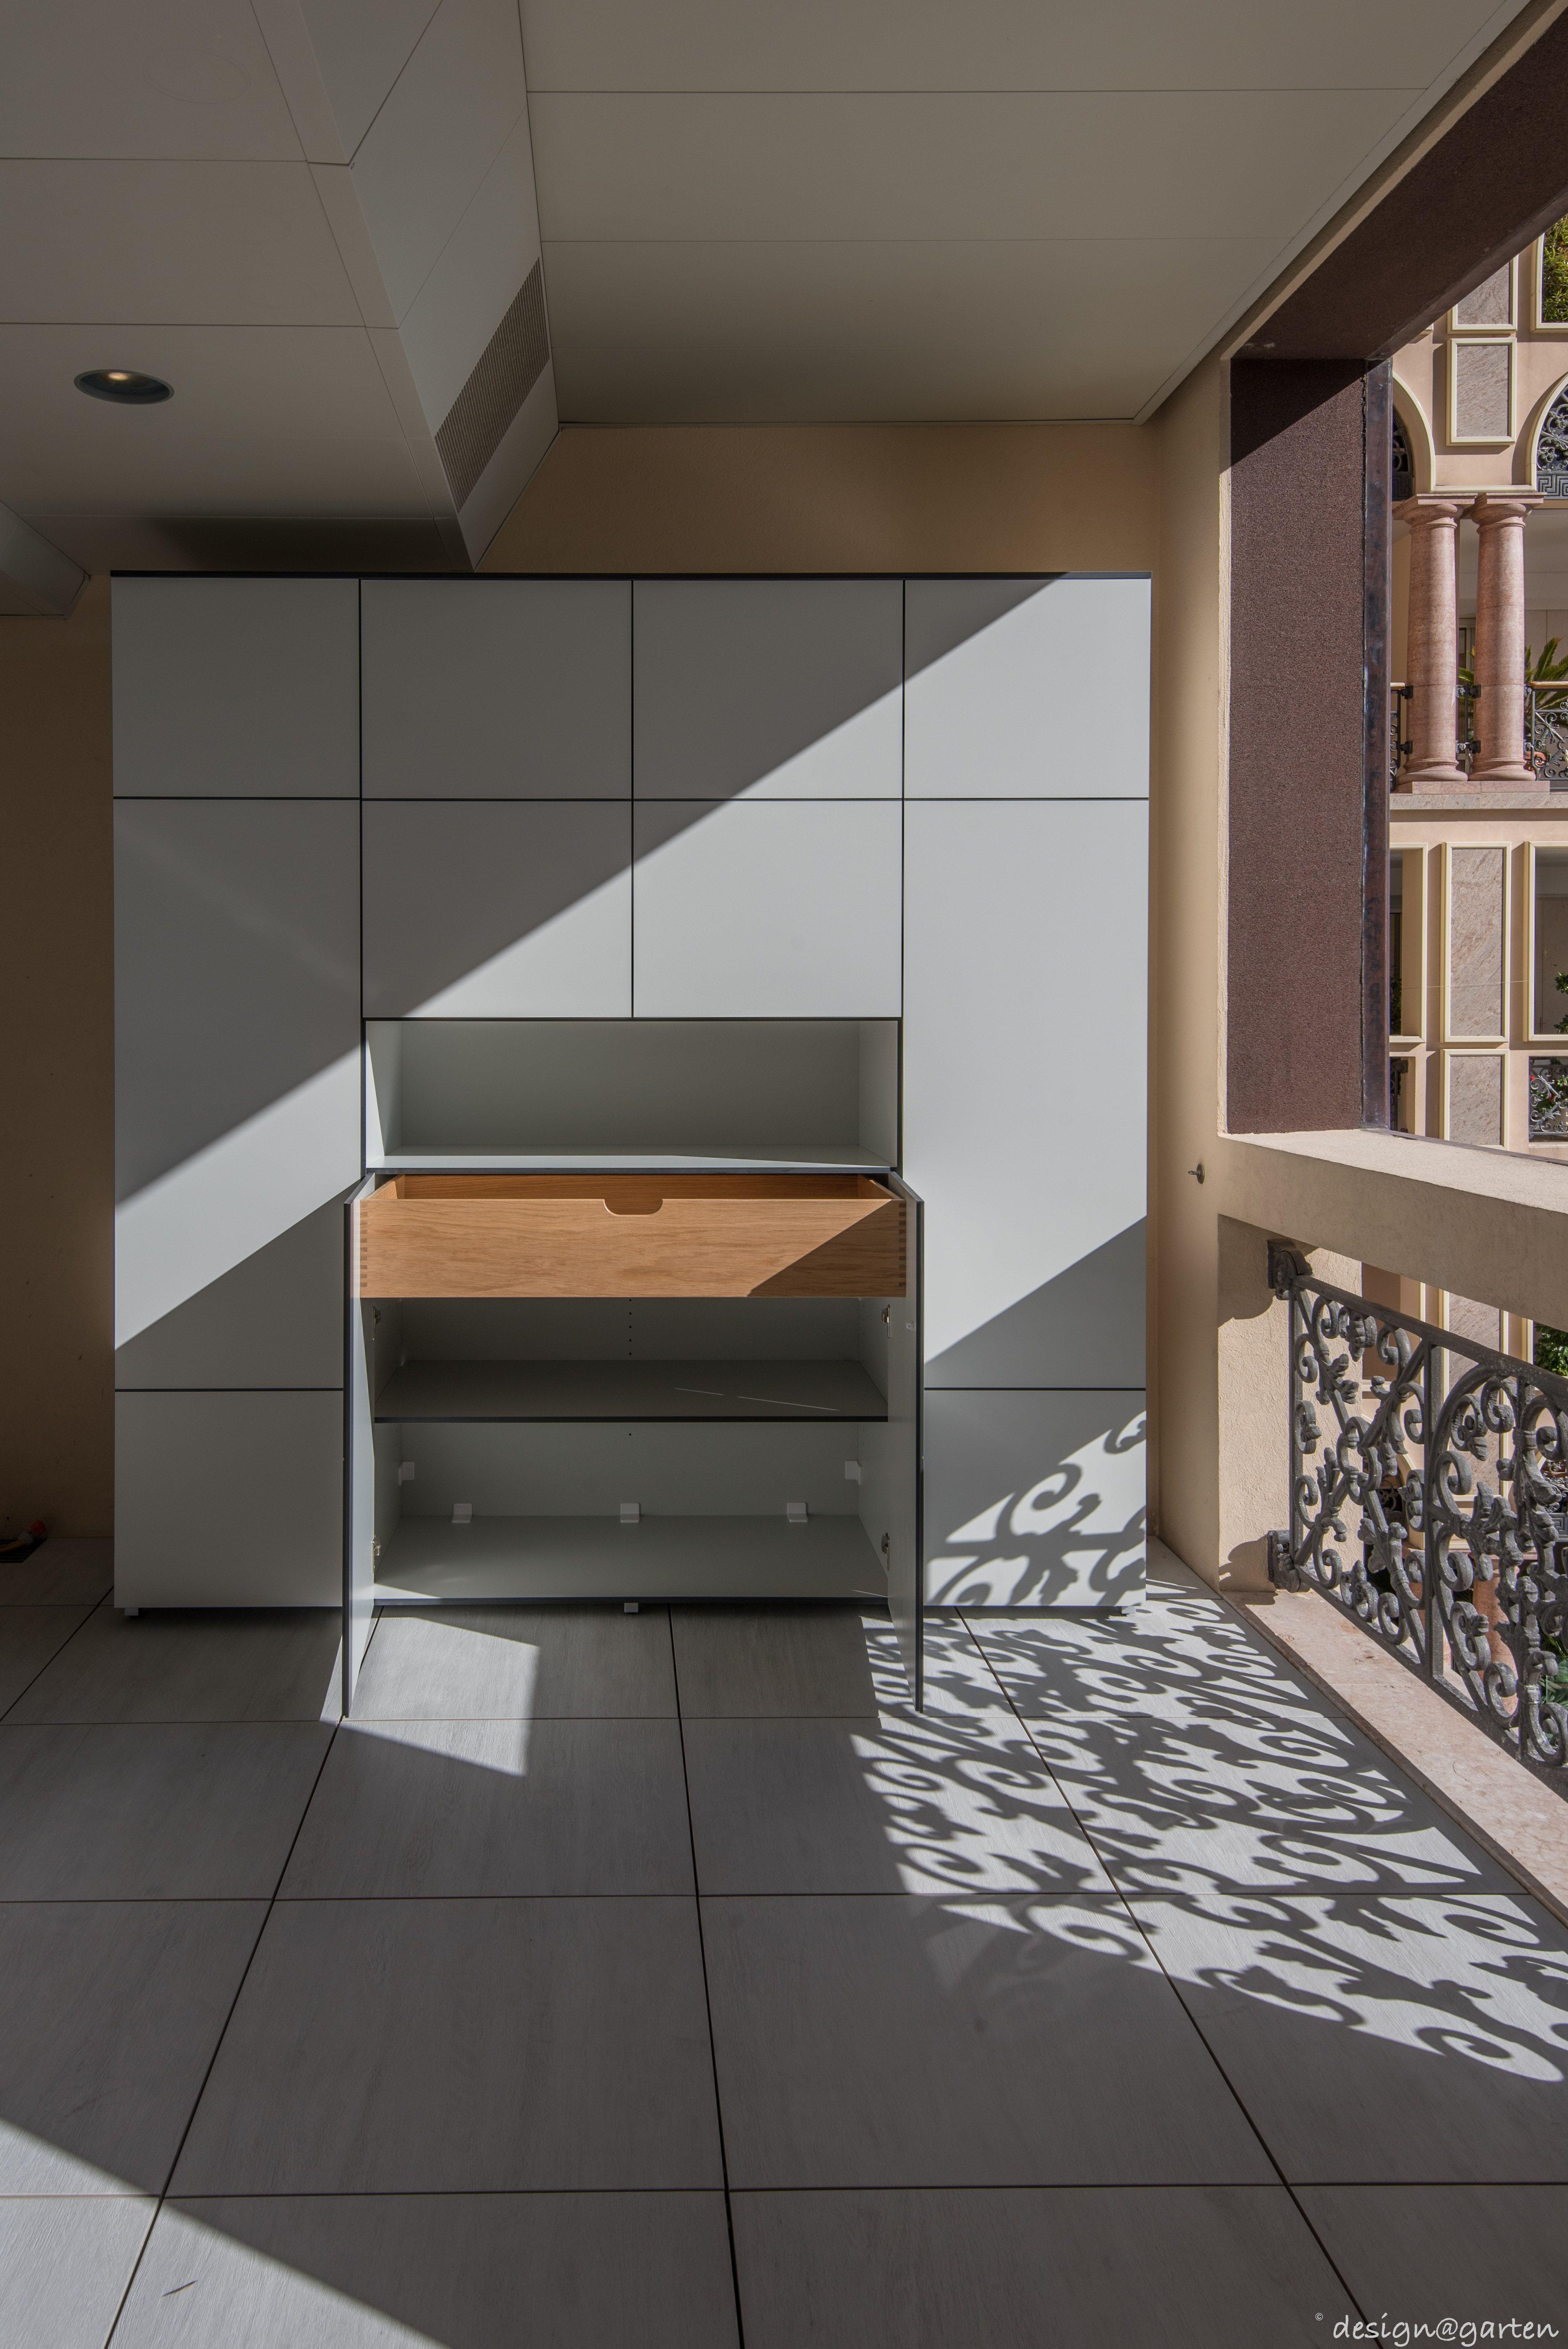 Terrassenschrank Win Wetterfest Uv Bestandig By Design Garten Projekt In Monaco Terrassenschrank Gartenschrank Home Decor Decor Room Divider